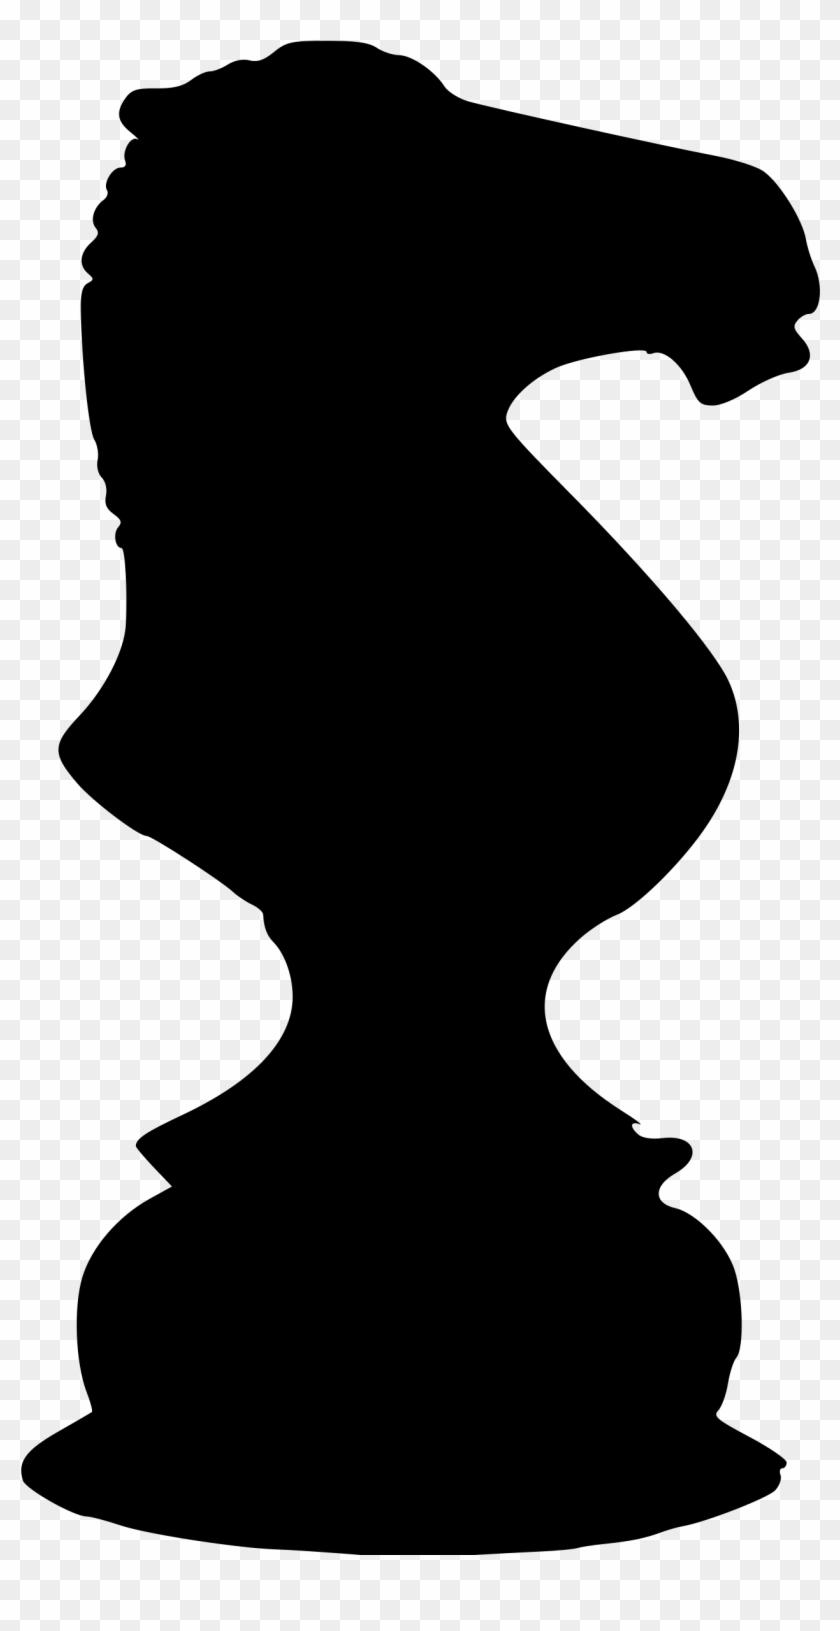 Clipart Knight Chess Piece Clipart Best Clipart Best - Knight Chess Piece Clipart #727517